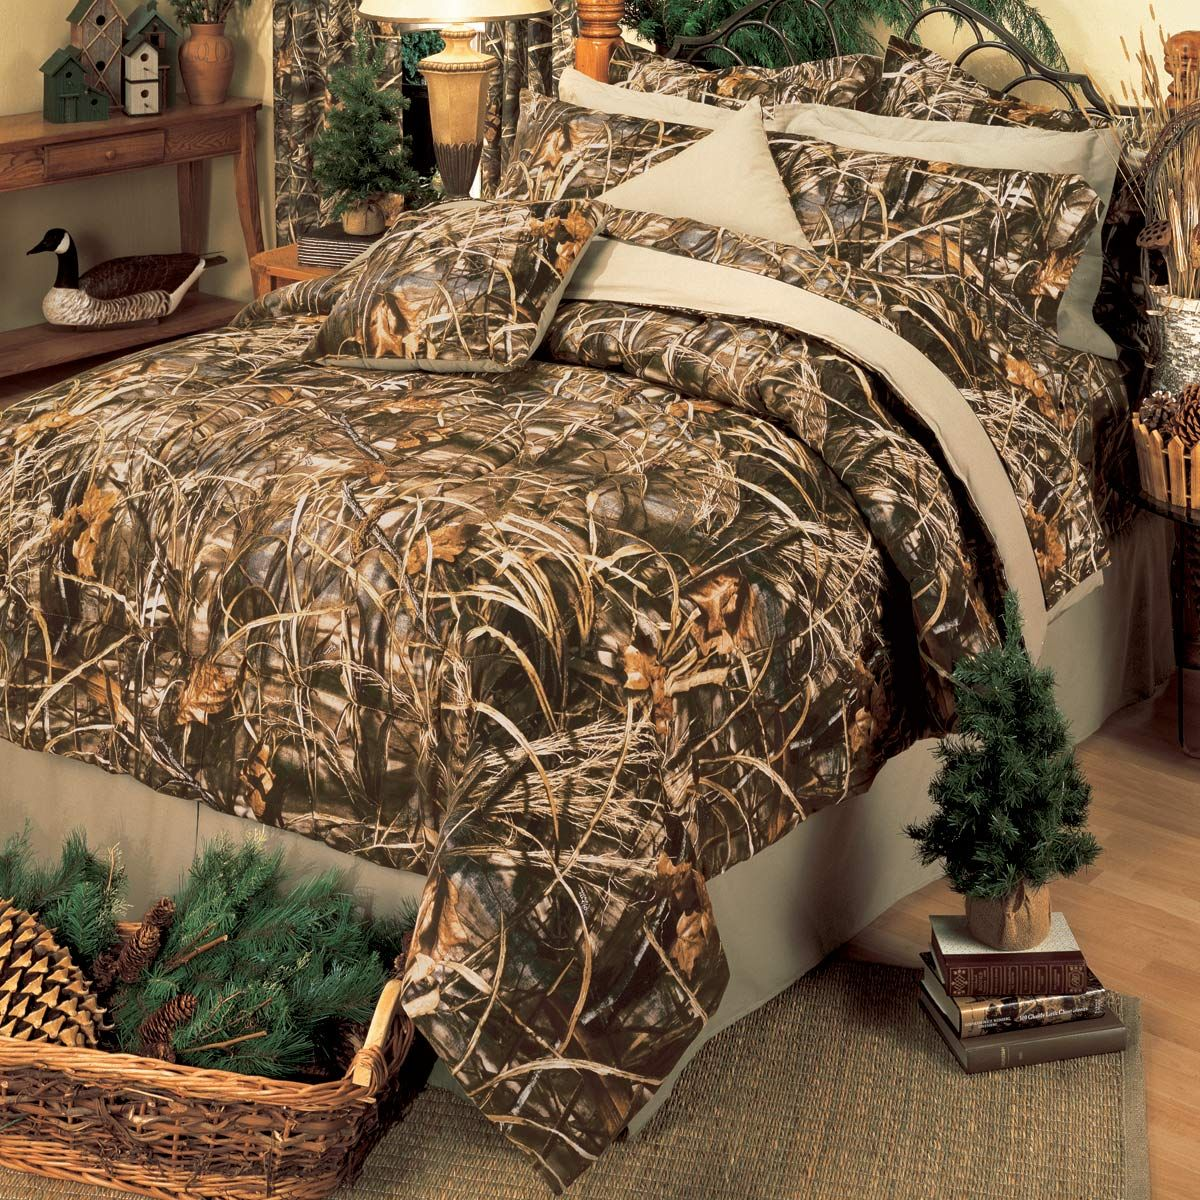 Max 32 Comforter Set King   Camo comforter sets, Camo bedding, Camo ...